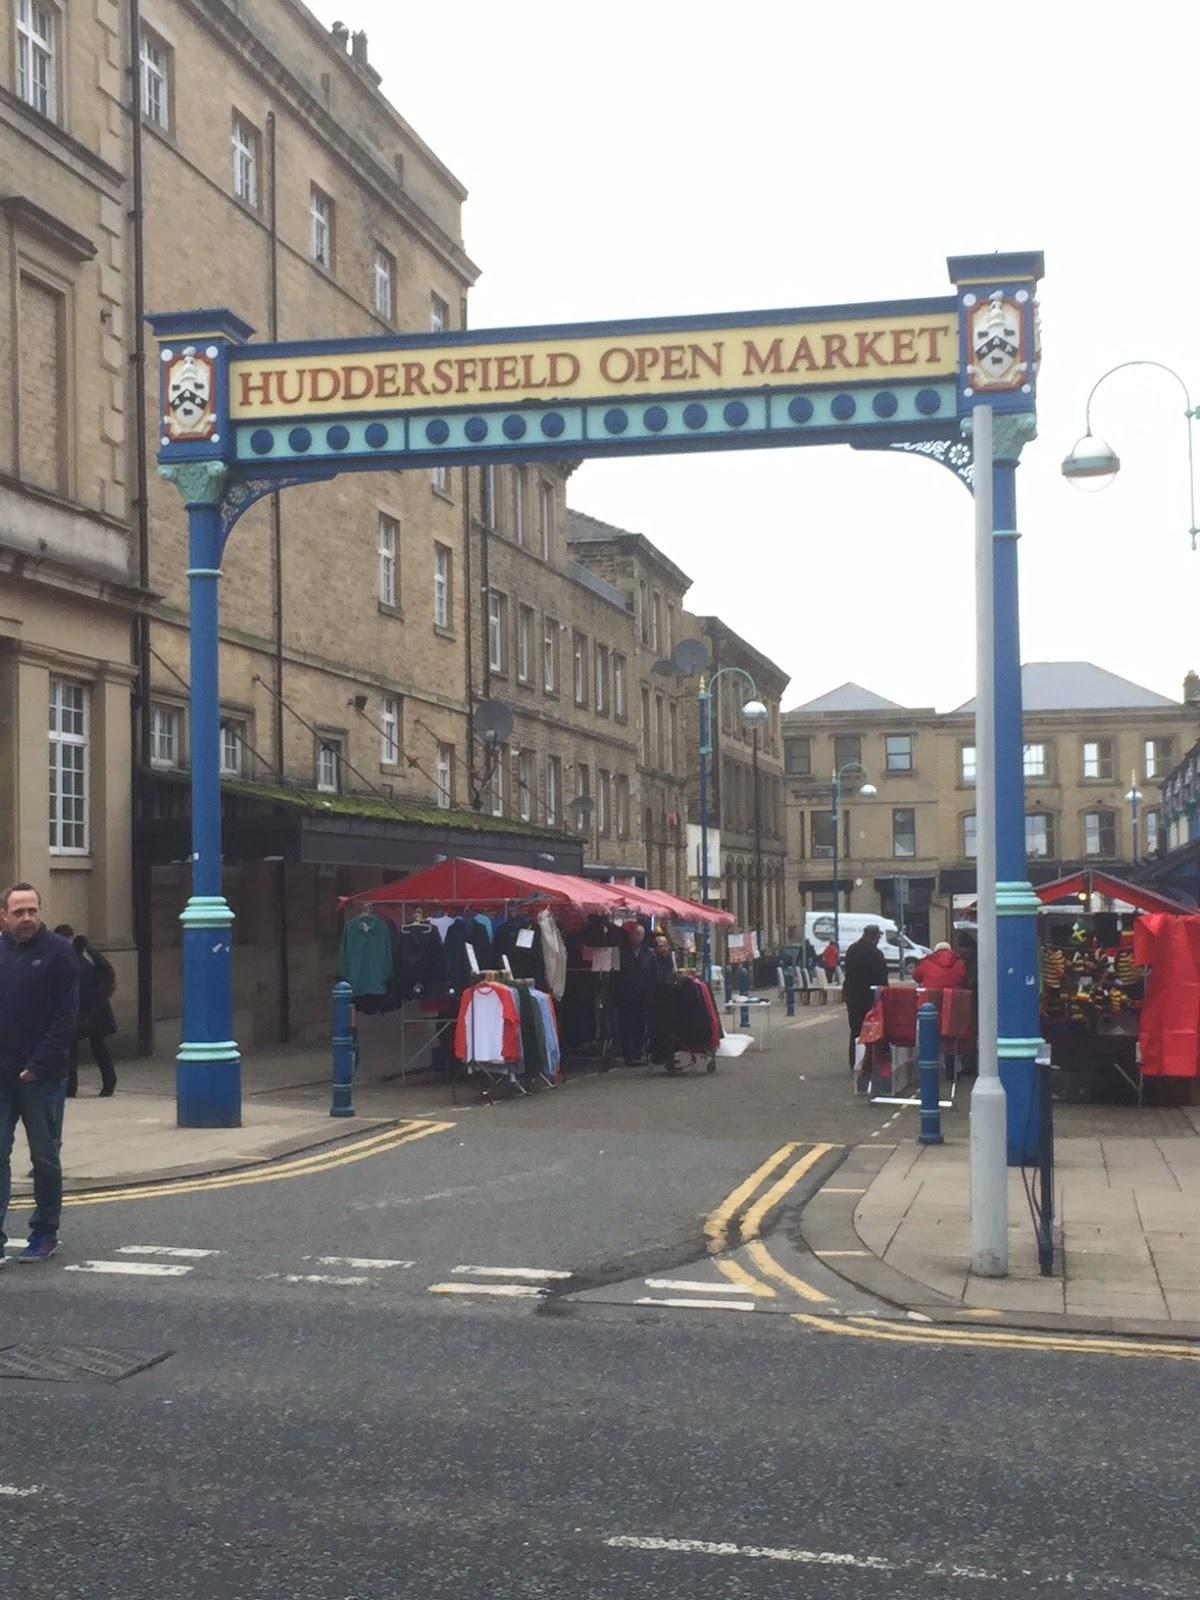 Market Britain's Worst Towns 2019 Revealed